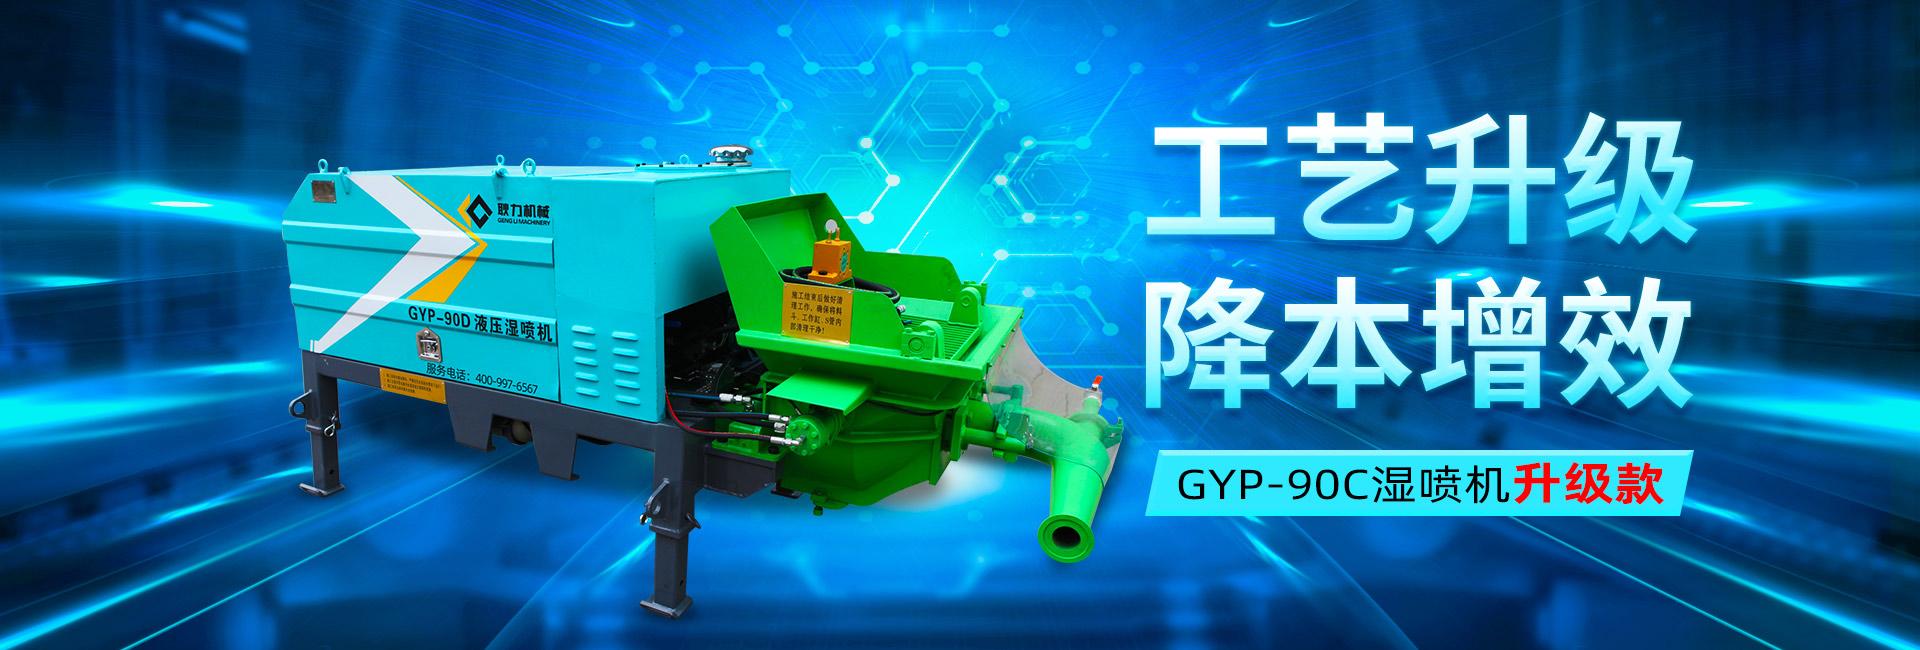 GYP-90D混凝土湿喷机